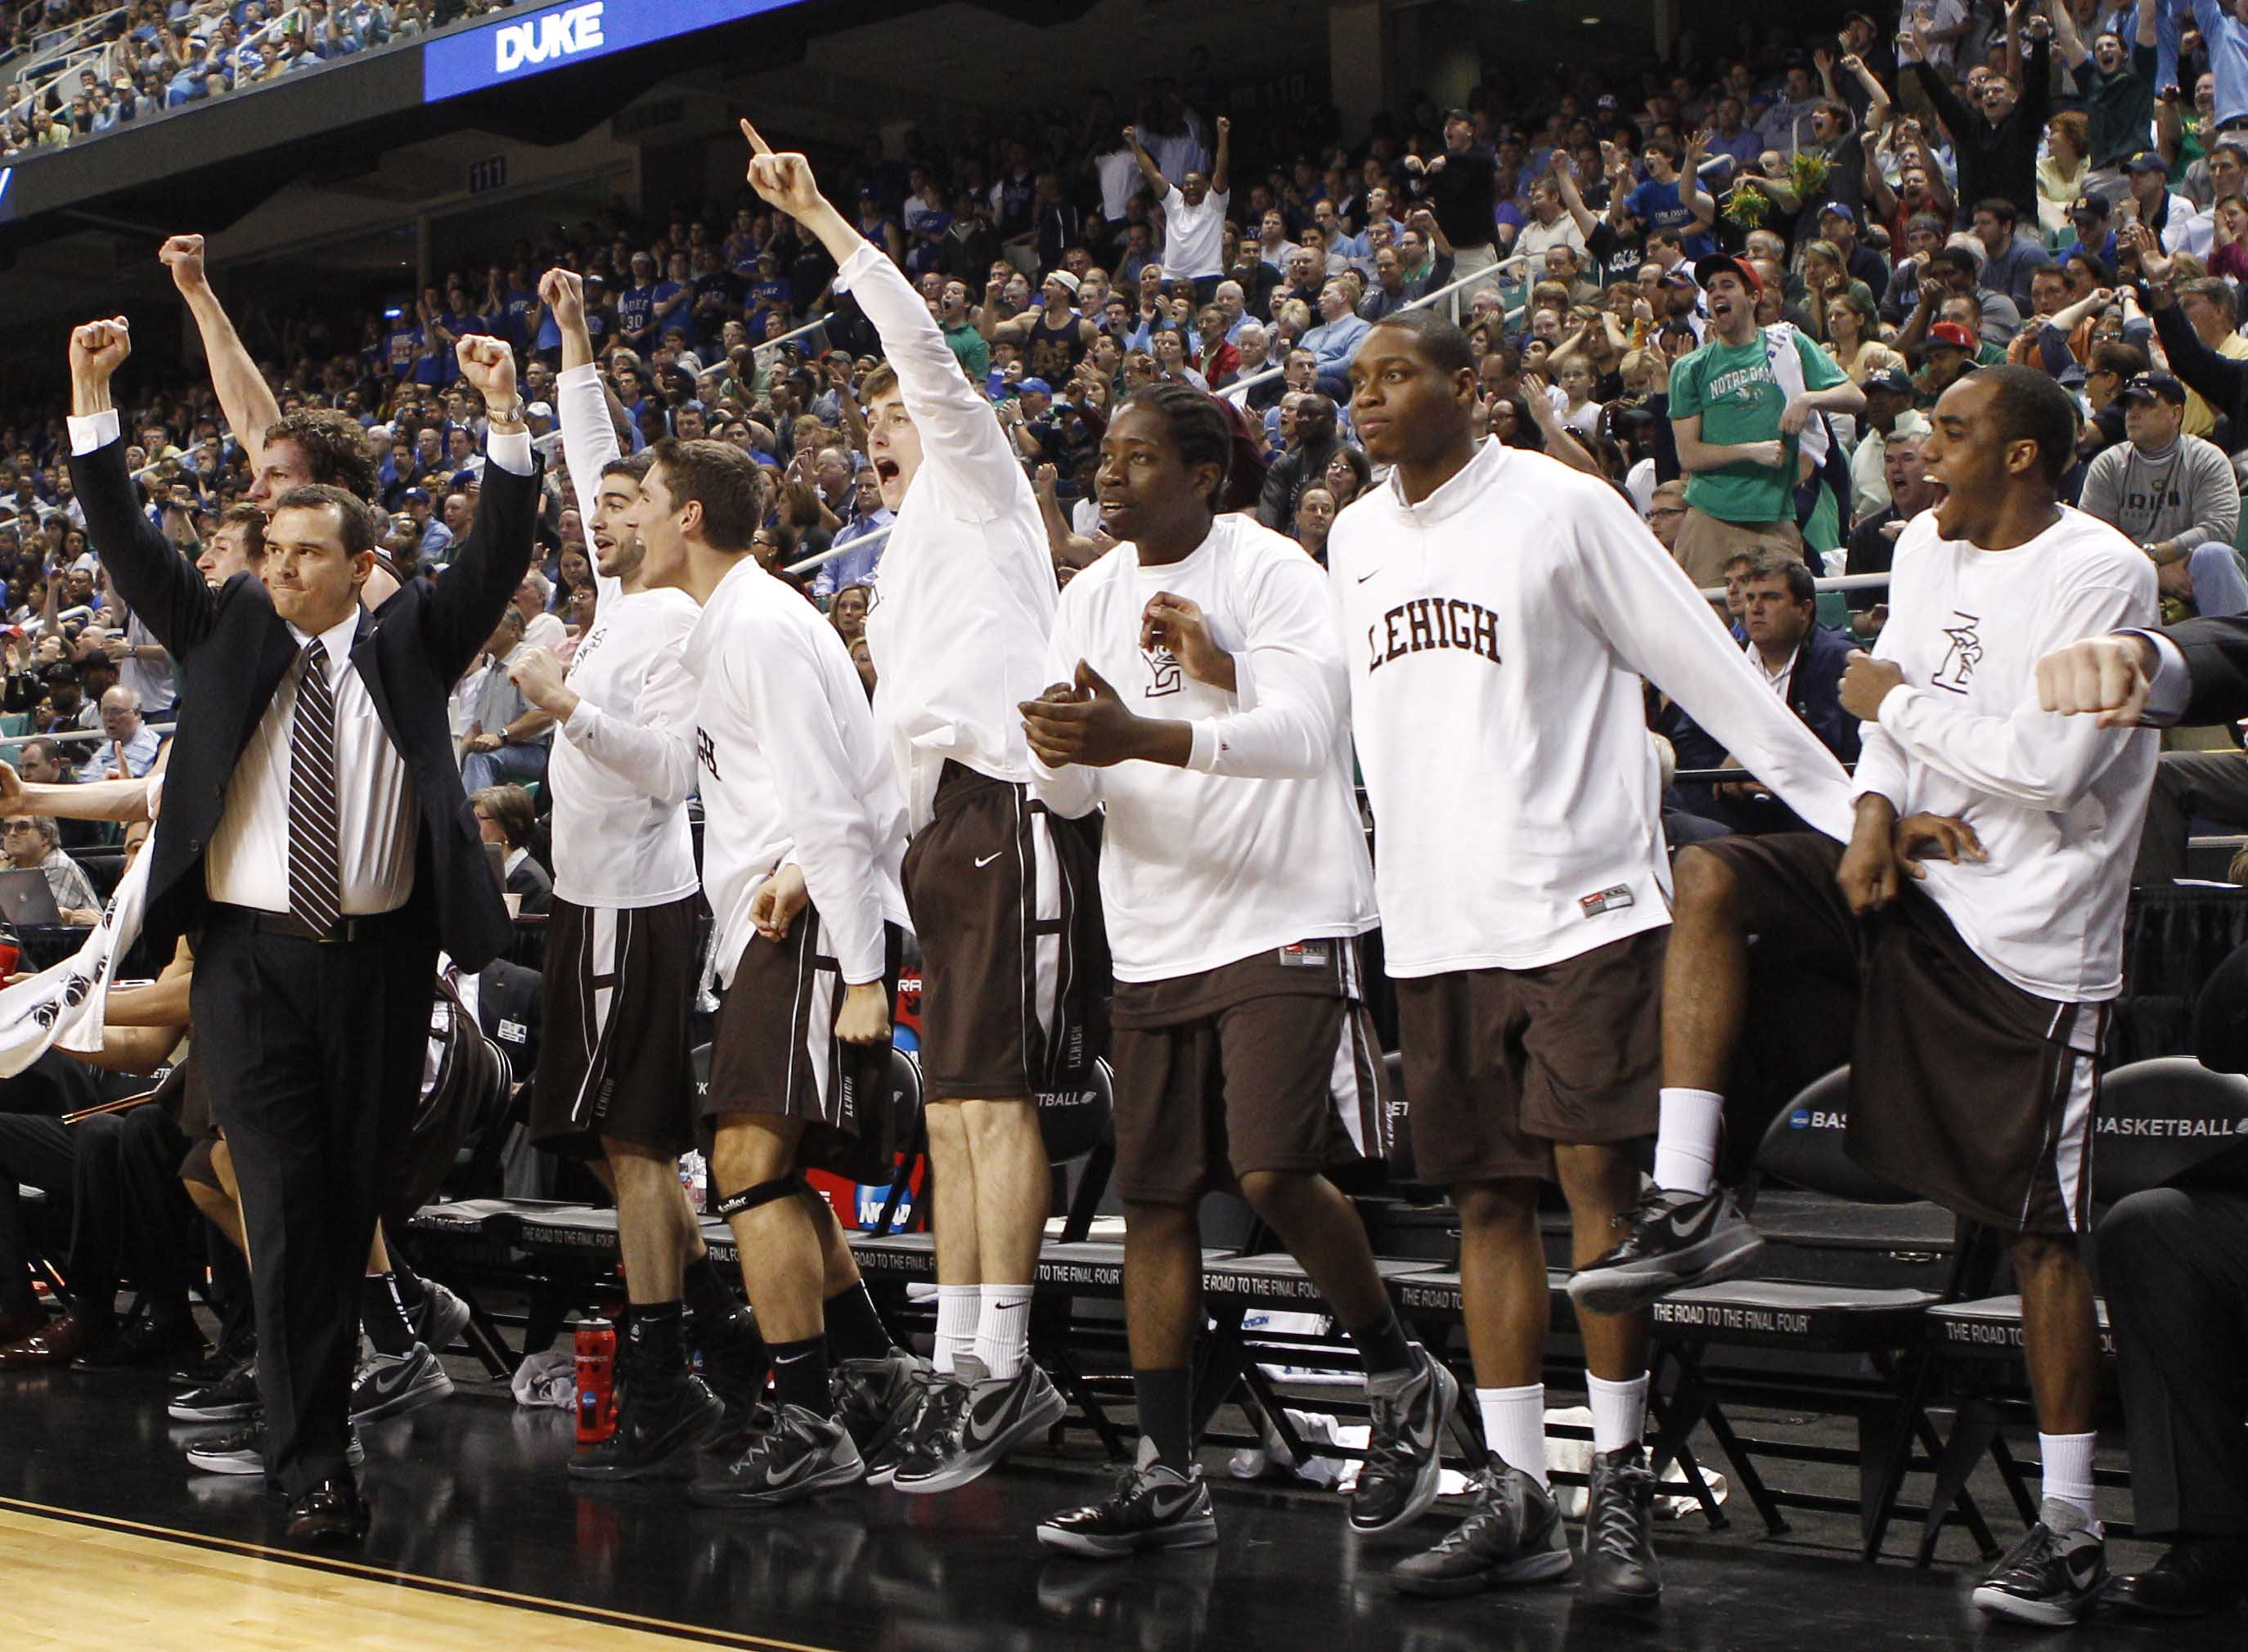 NCAA Basketball: Division I Championship-Lehigh vs Duke